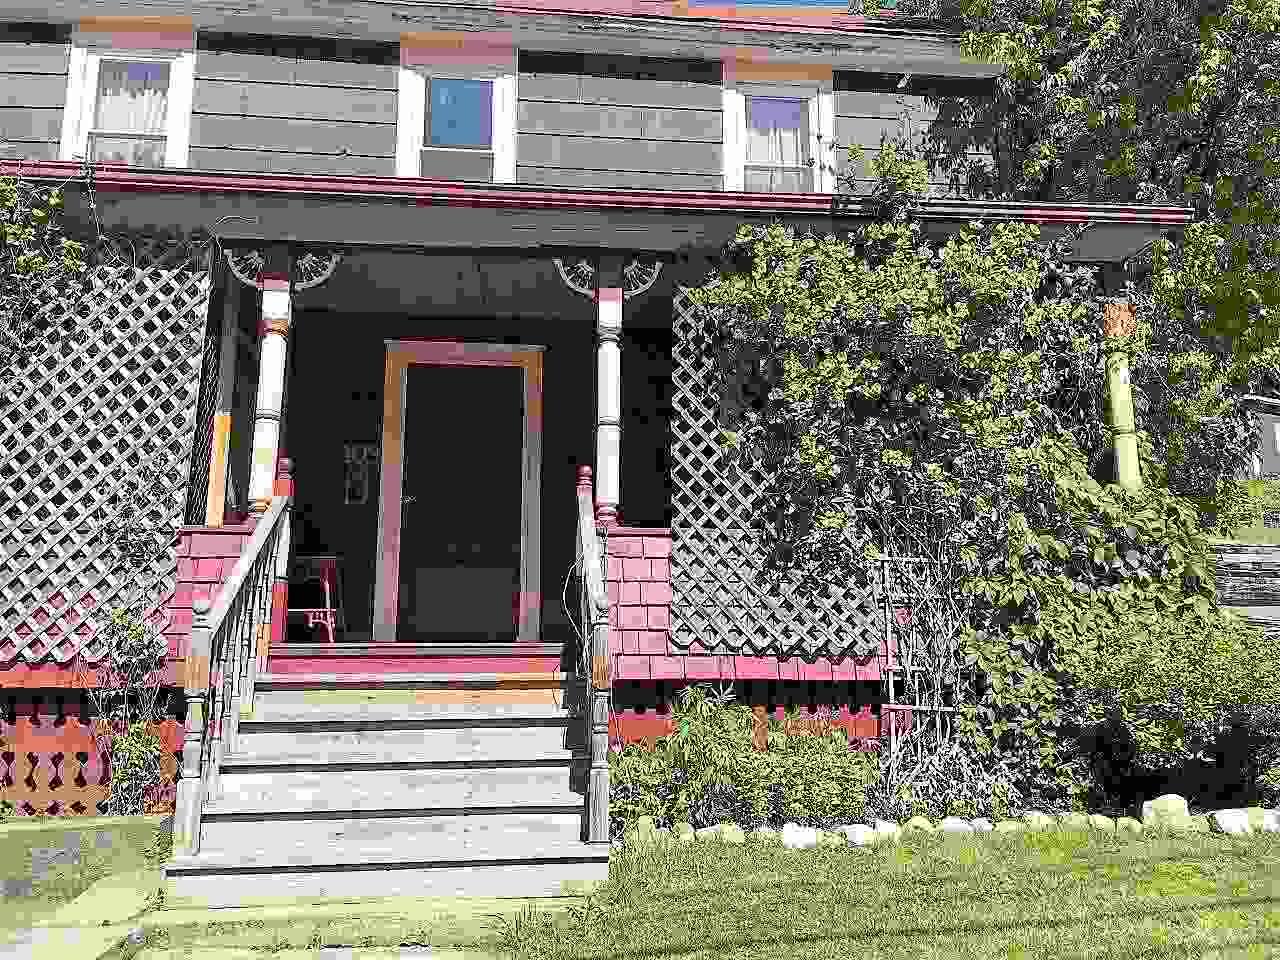 109 Caledonia Street, St. Johnsbury, VT - USA (photo 2)